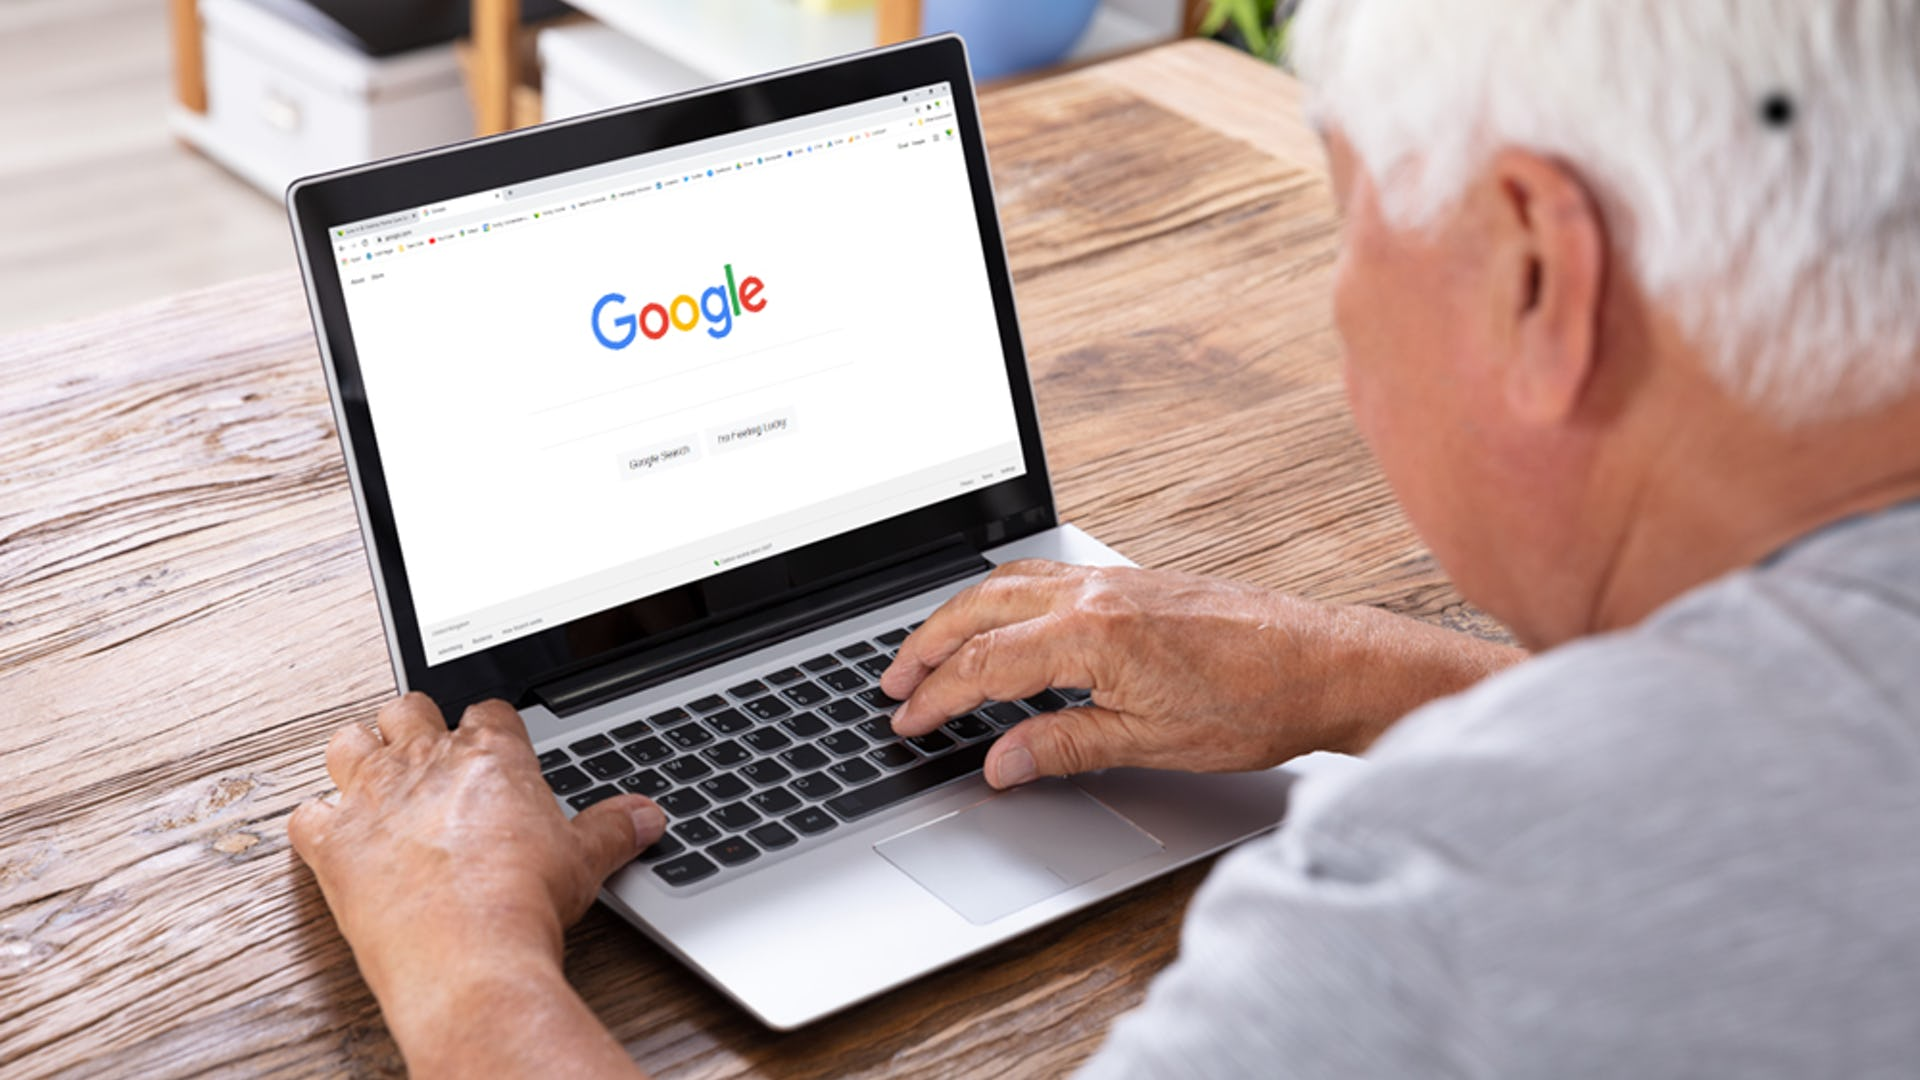 Google search on a laptop